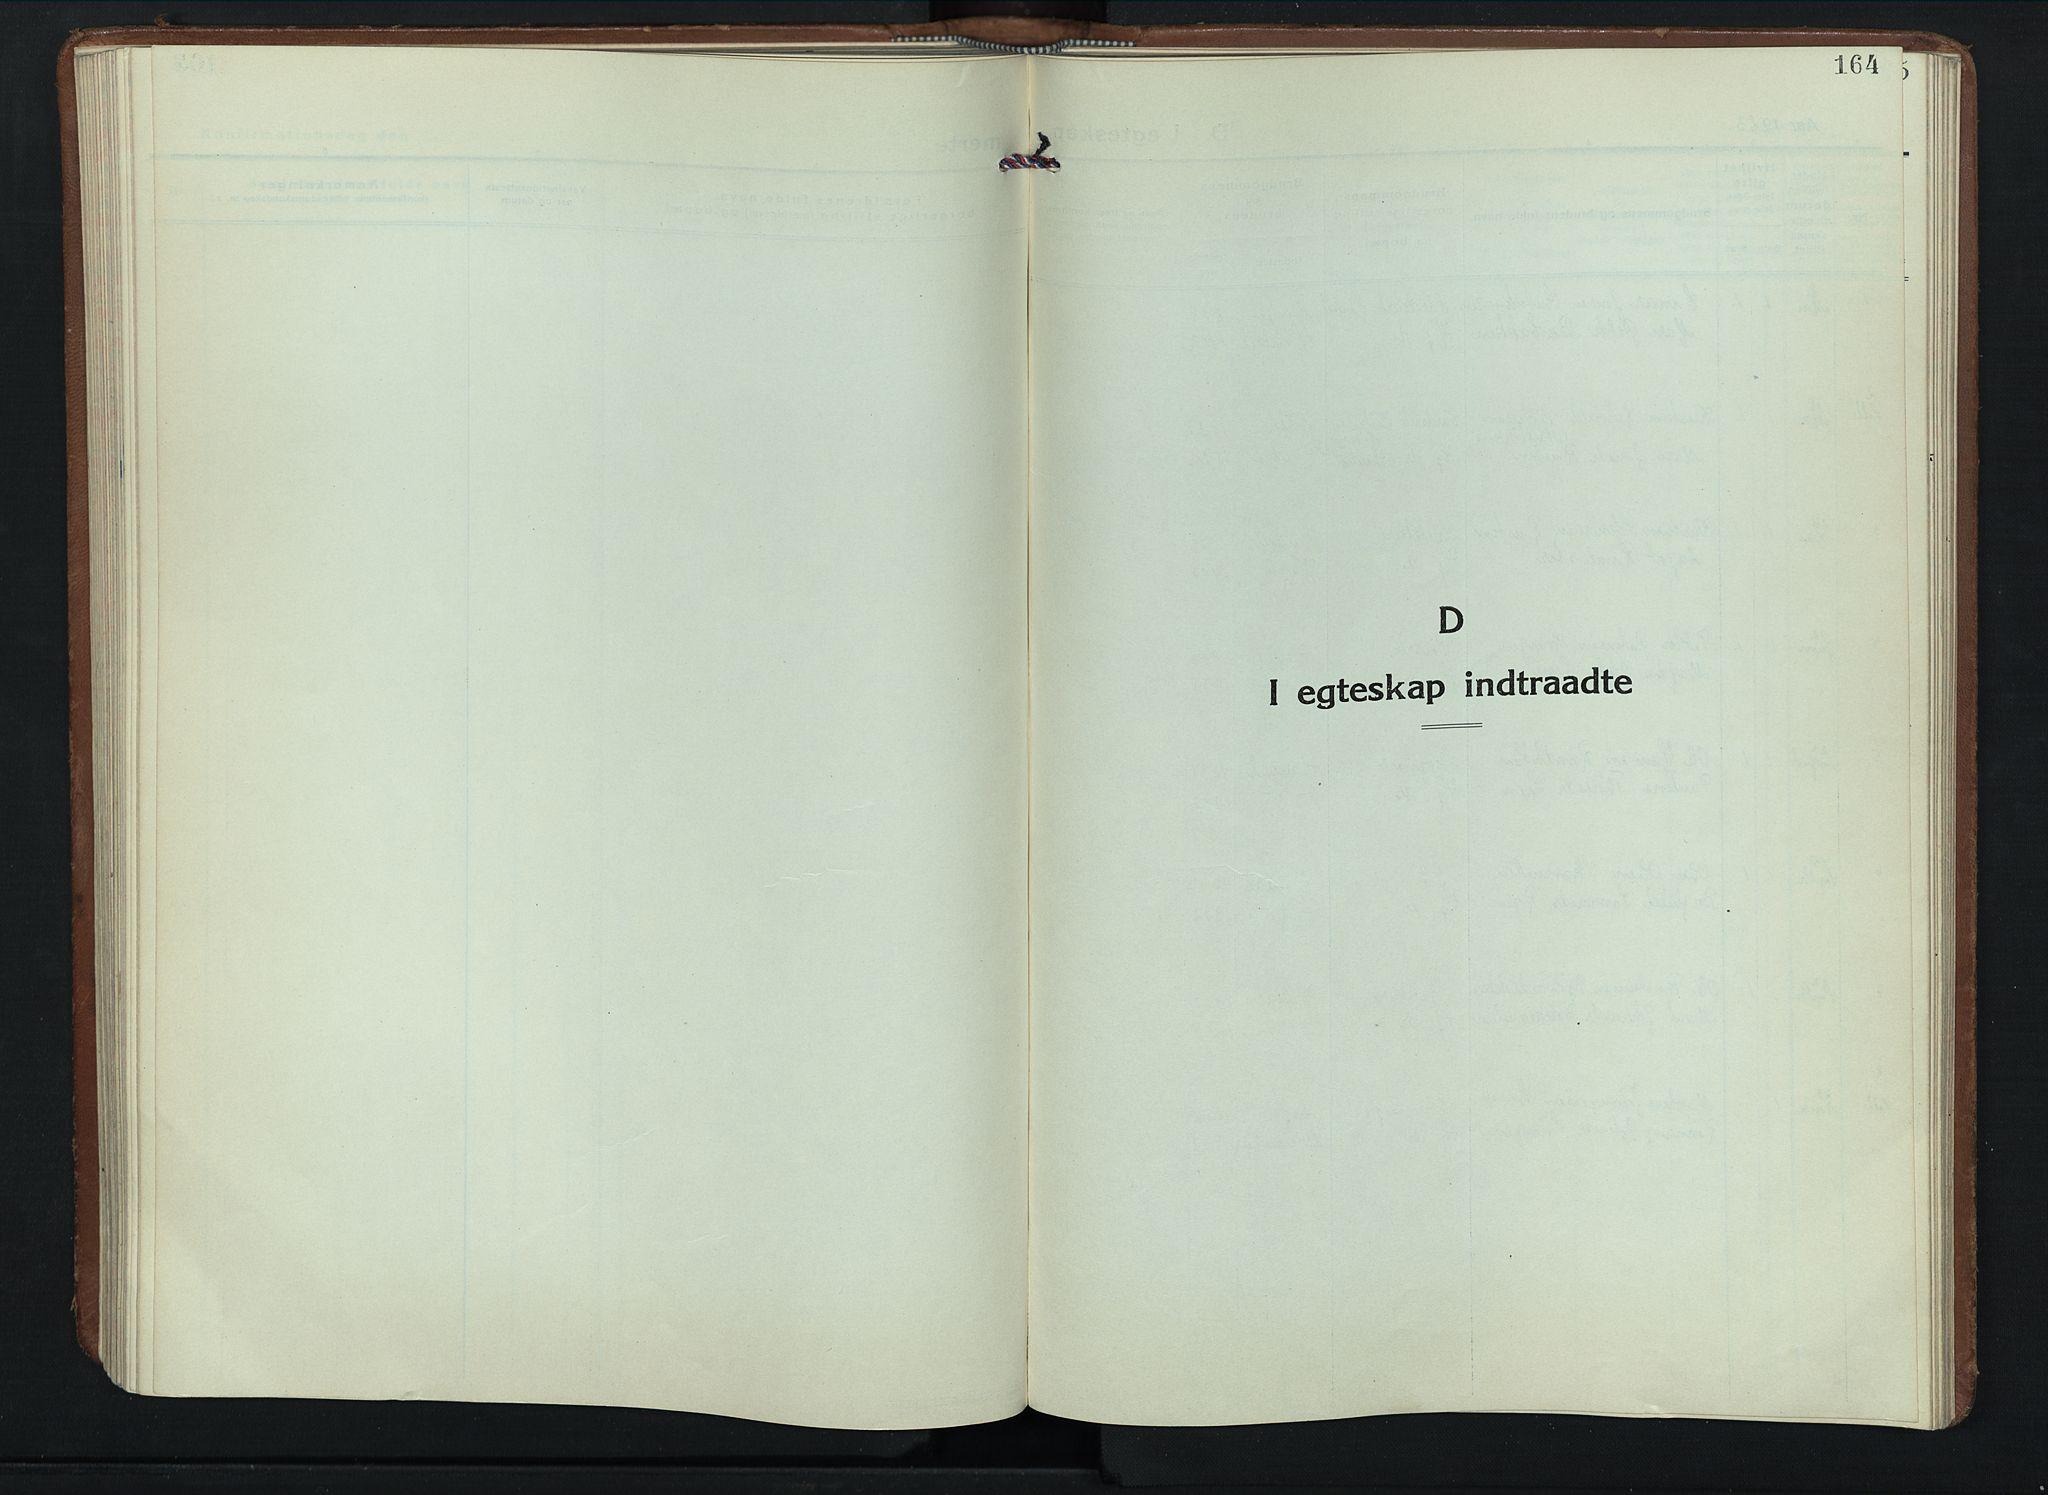 SAH, Sel prestekontor, Klokkerbok nr. 6, 1923-1953, s. 164